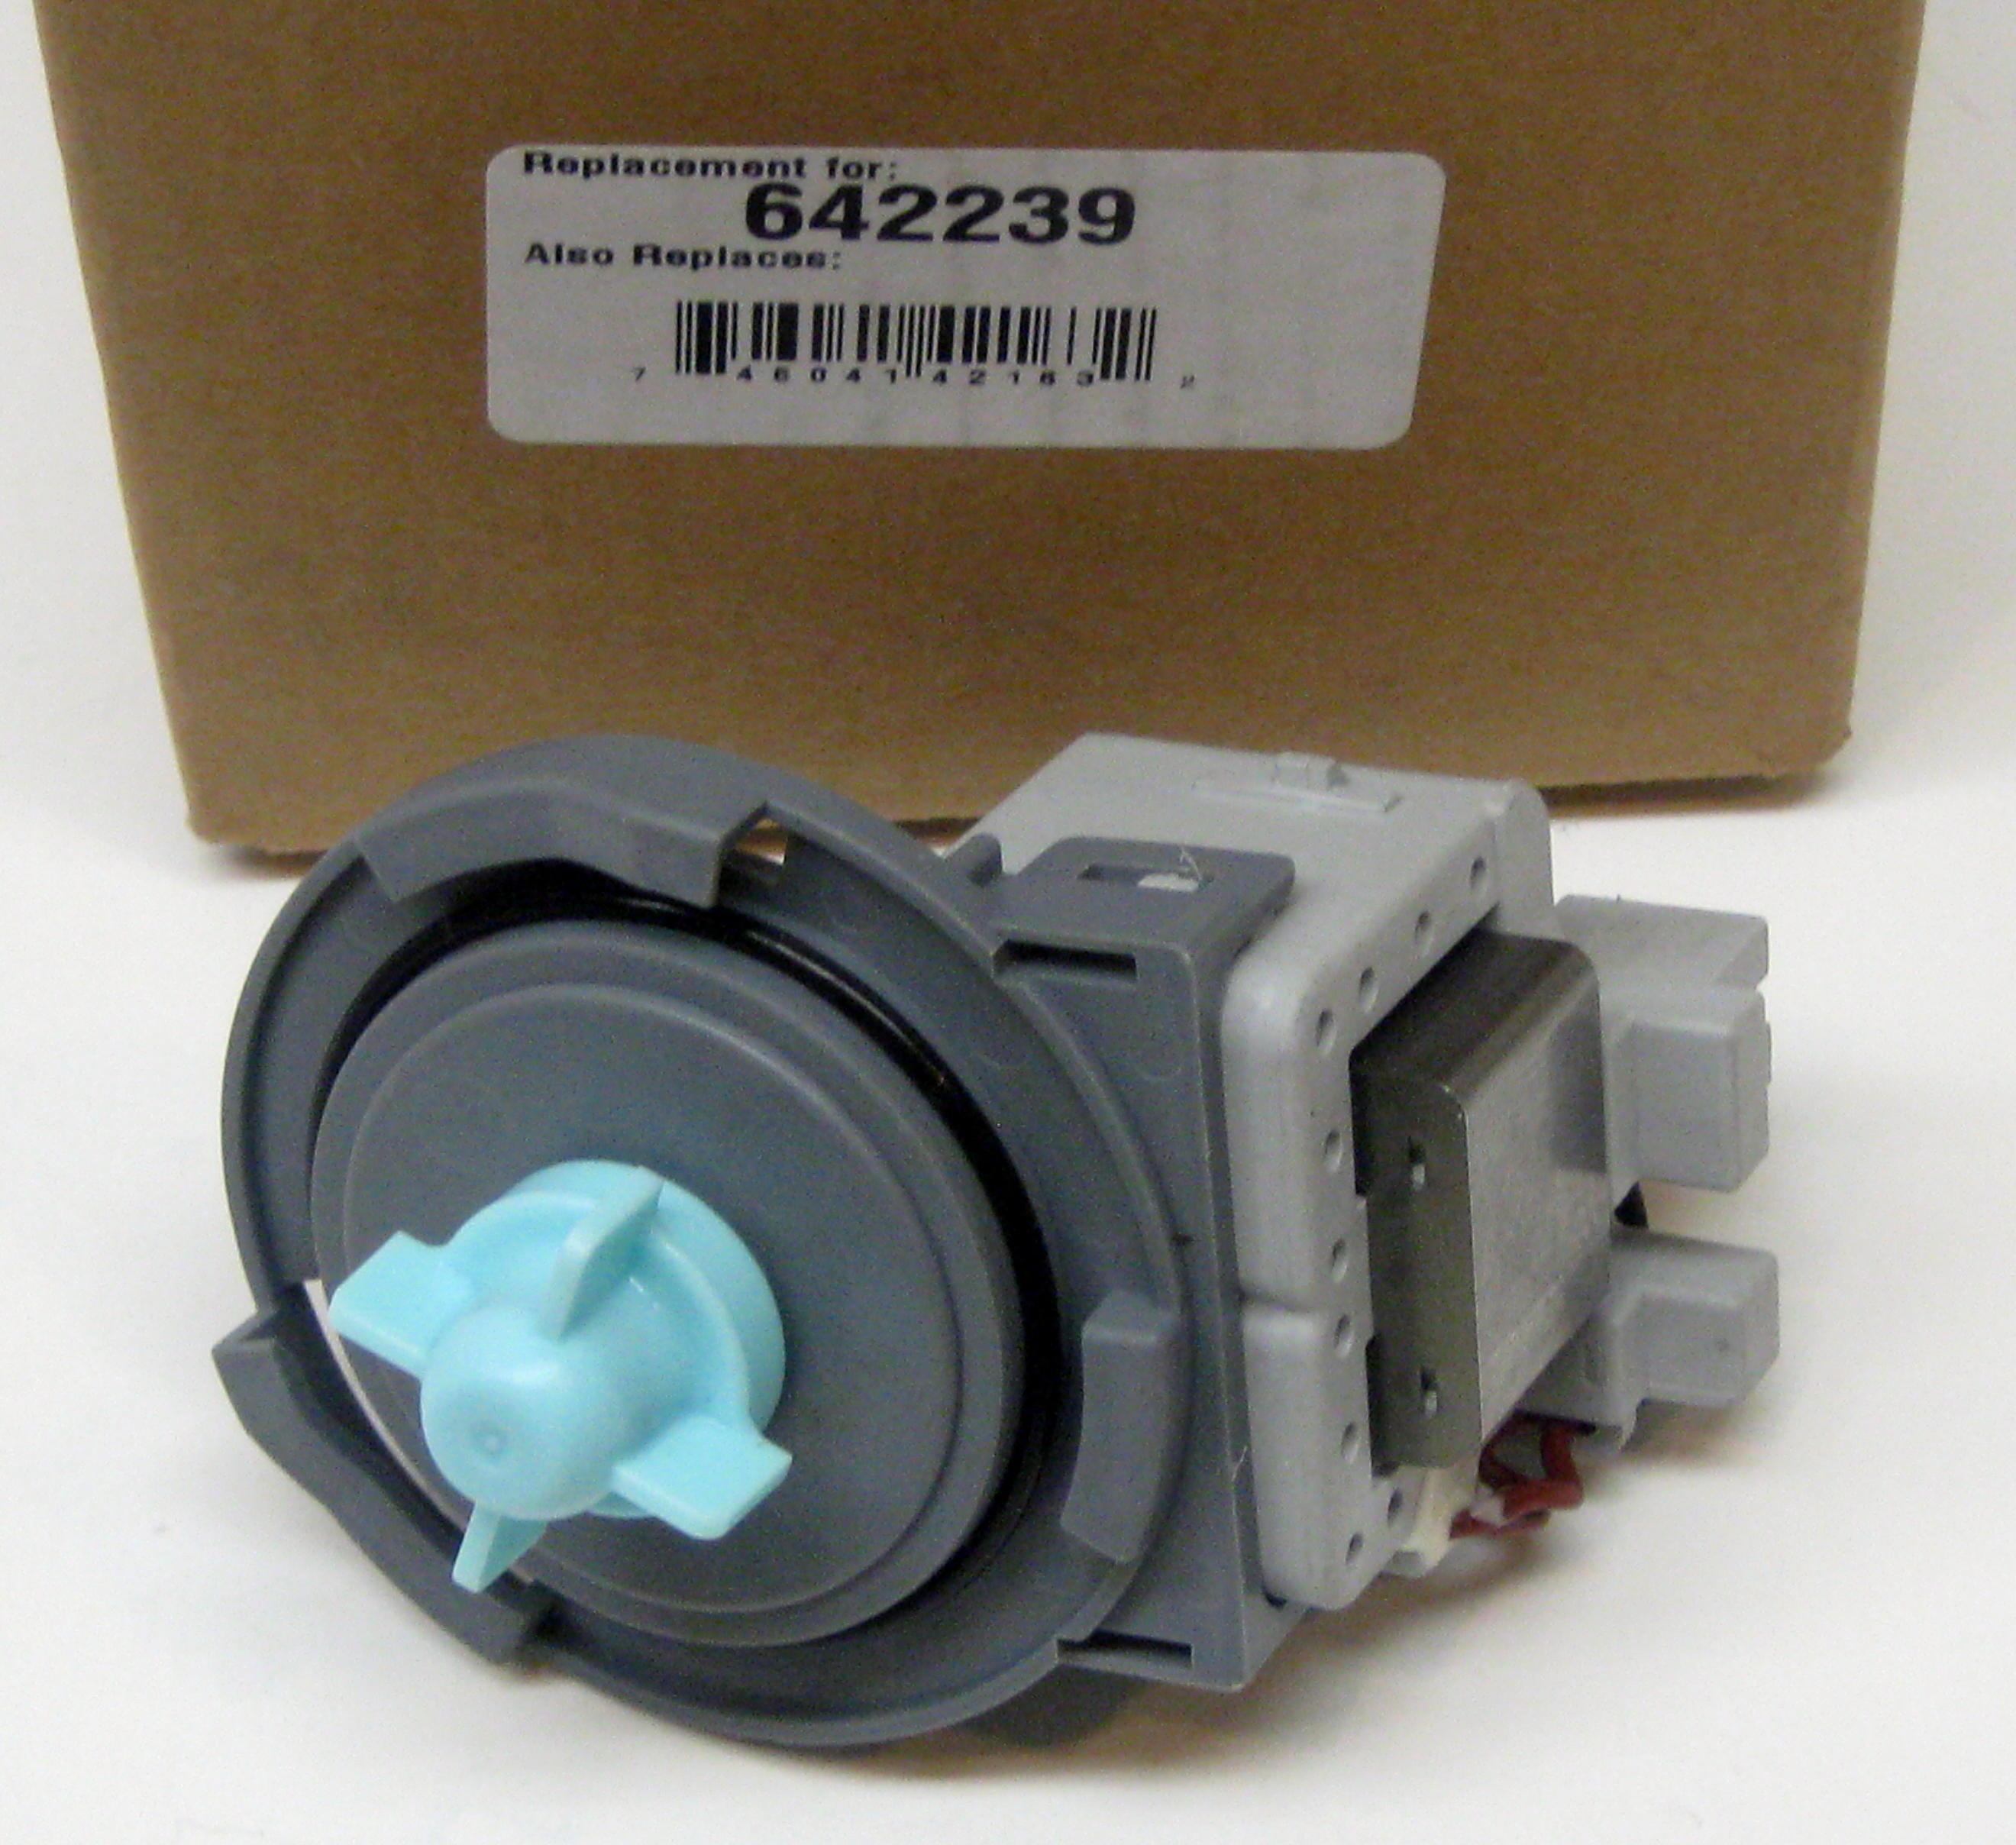 New Genuine Factory Sealed CopyStar TK-5199C Cyan Toner Cartridge 1T02R4CCS0001